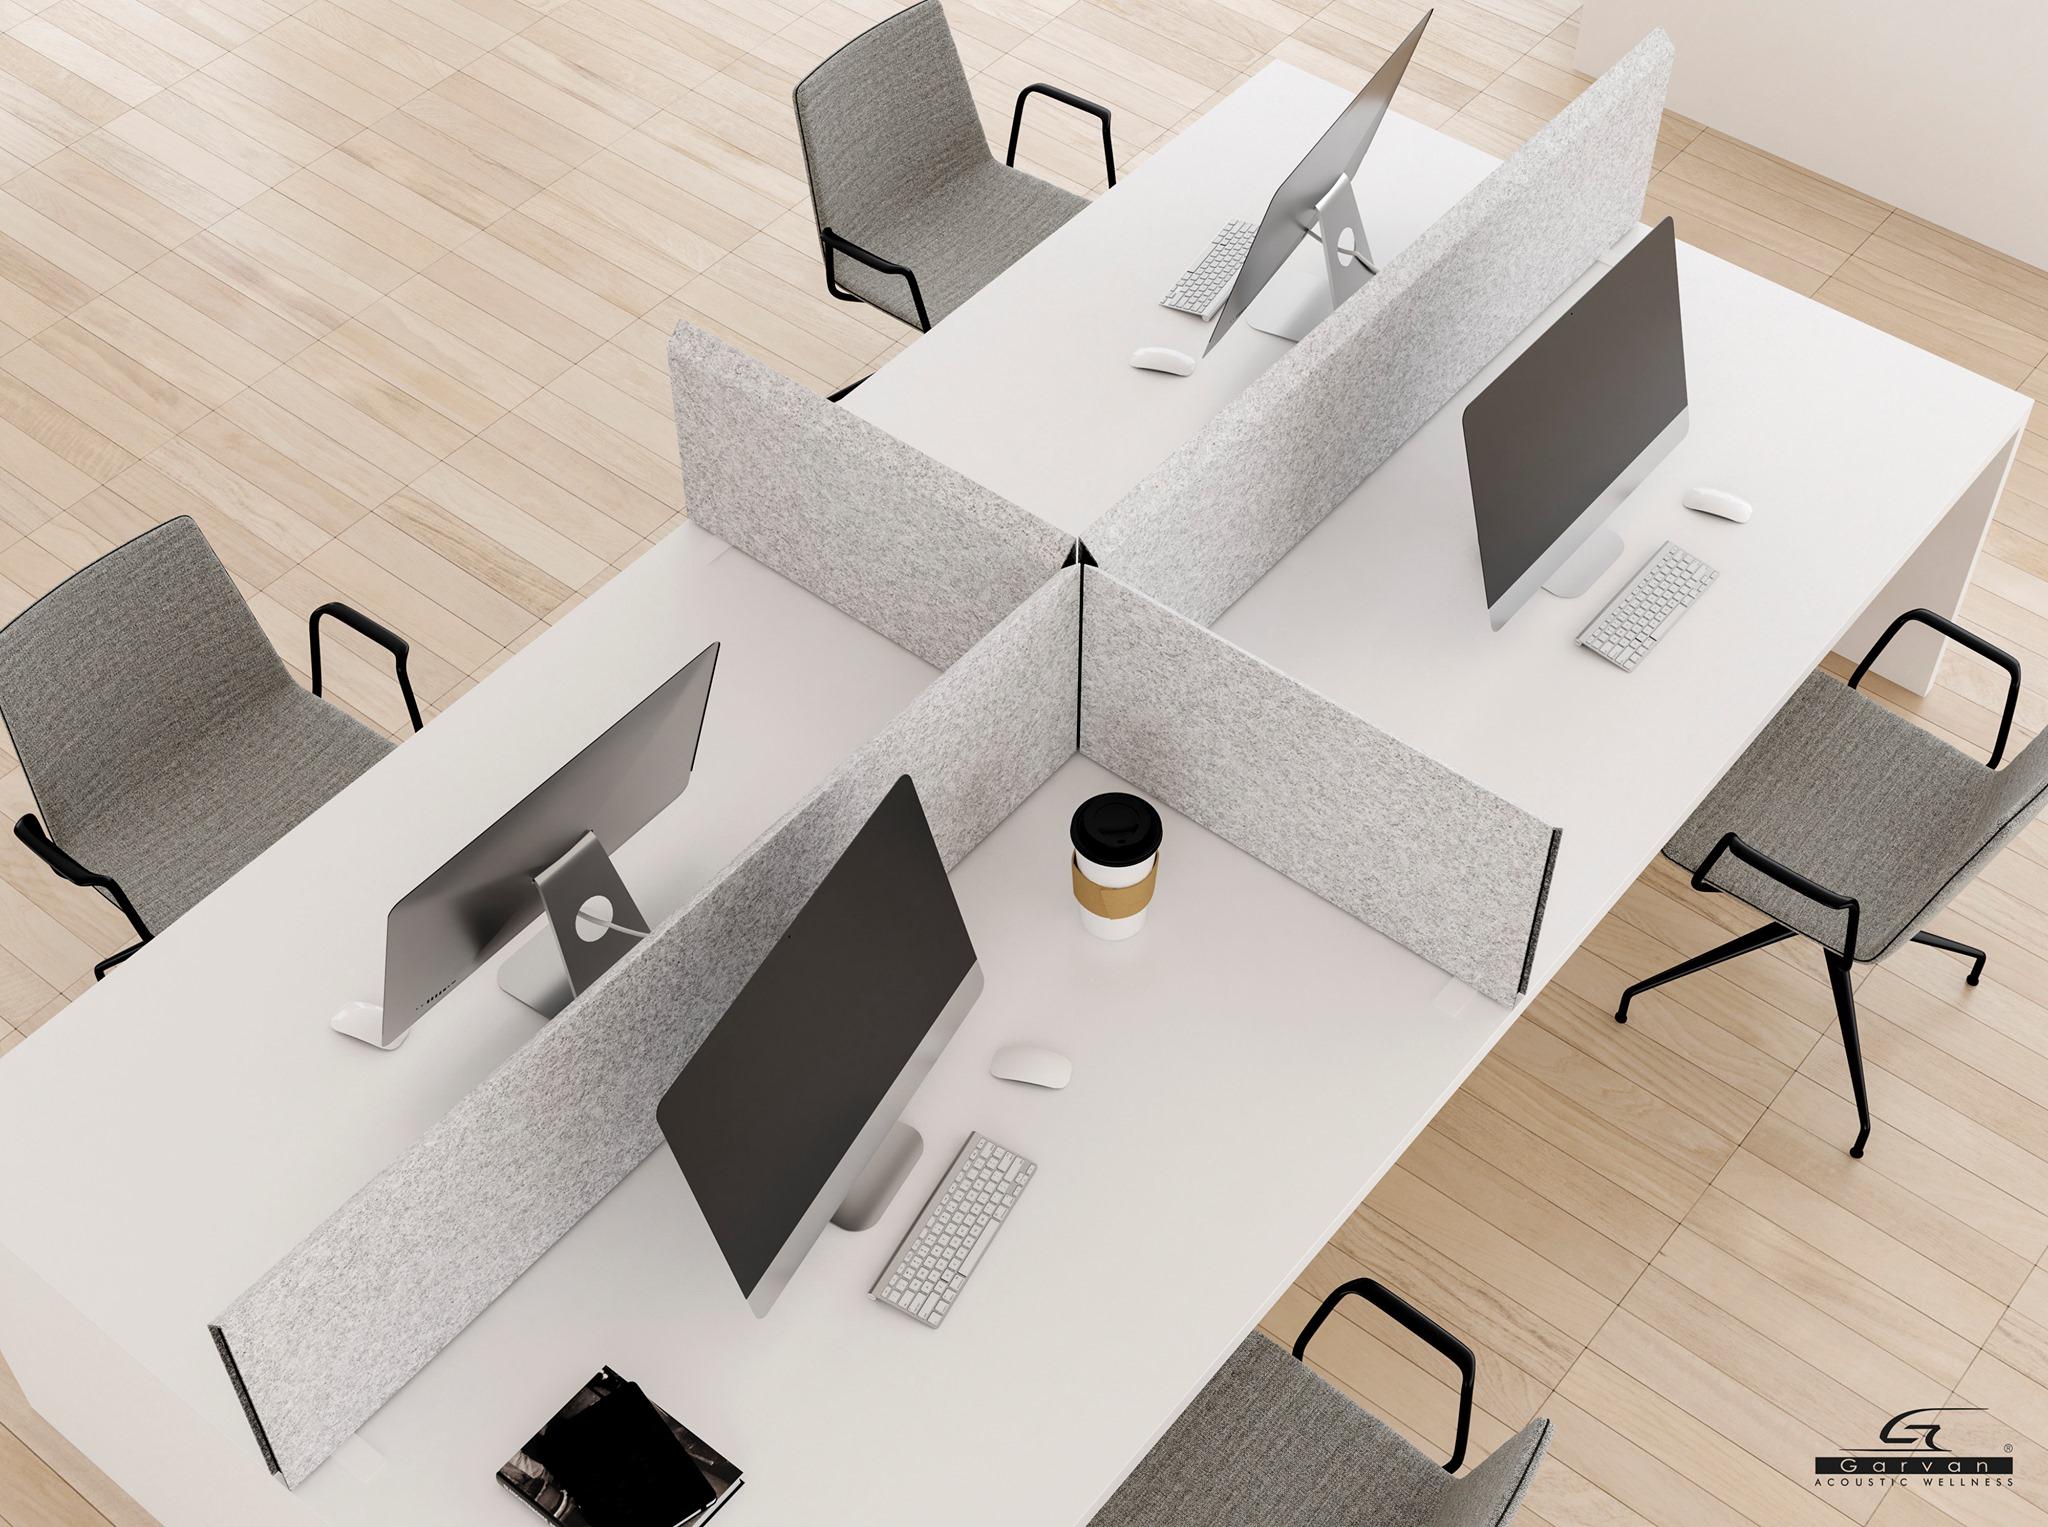 Acoustic panels for desk by Garvan